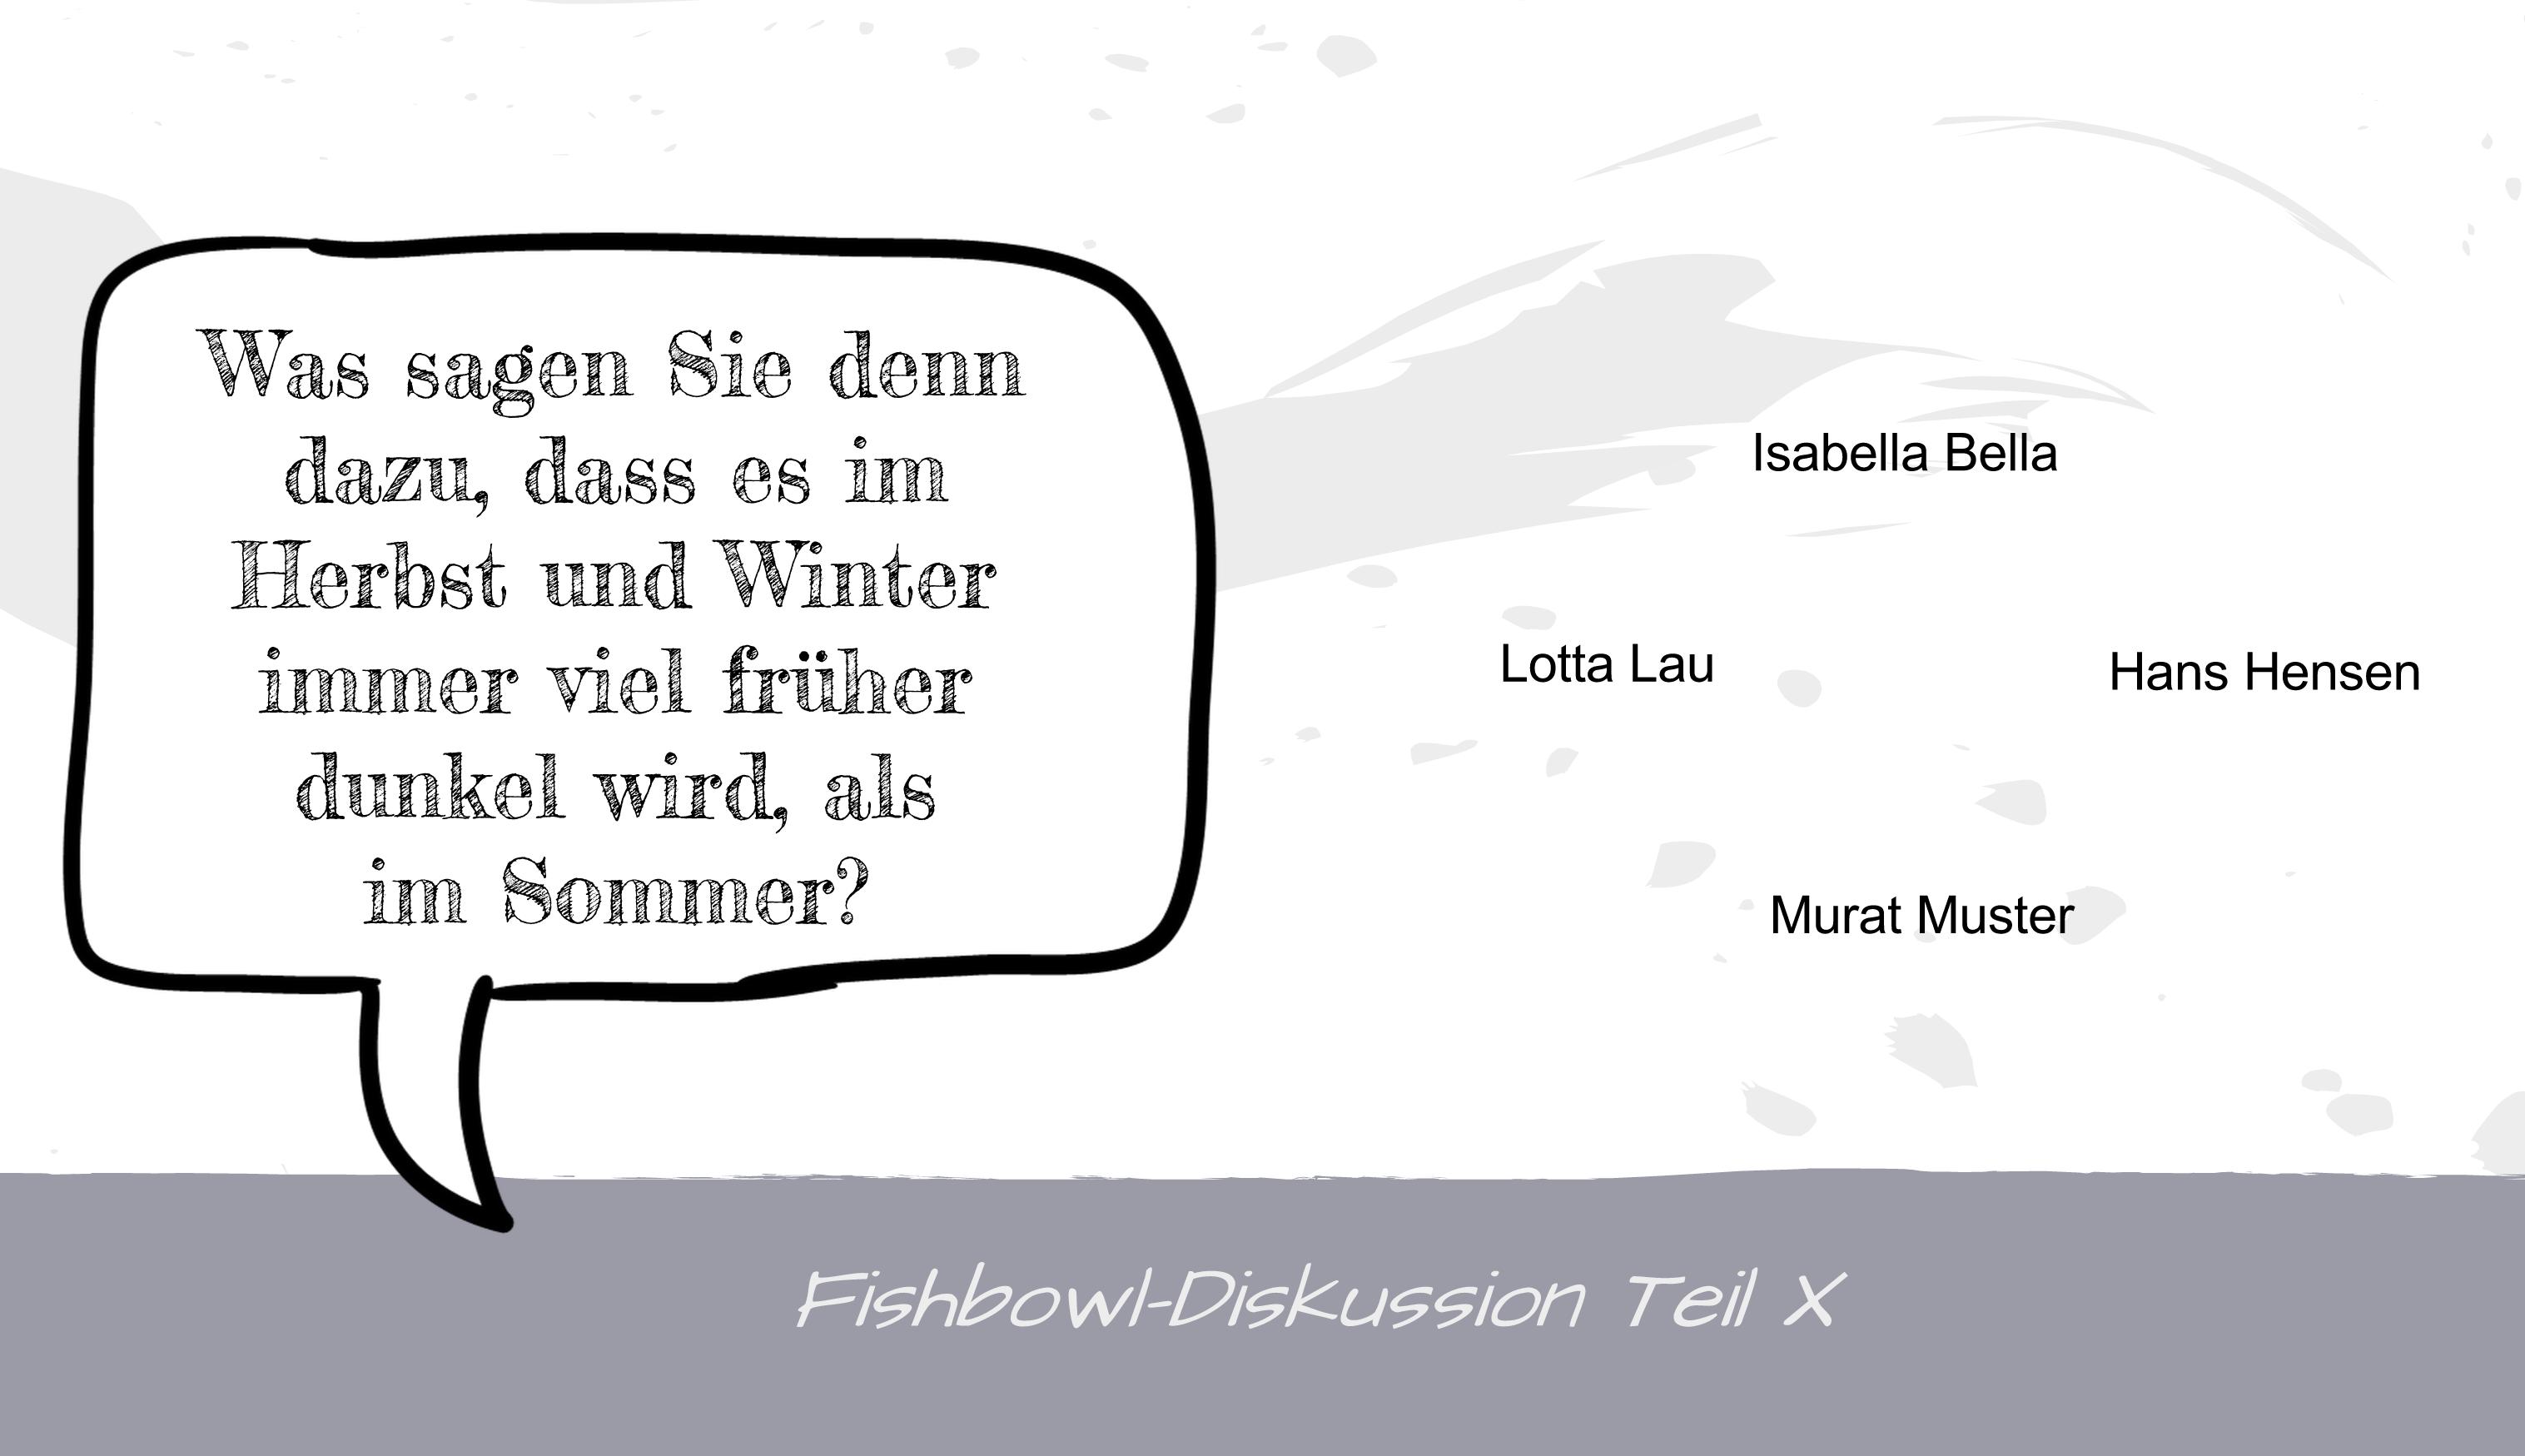 Freiwillie 1. Runde im Webinar Fishbowl